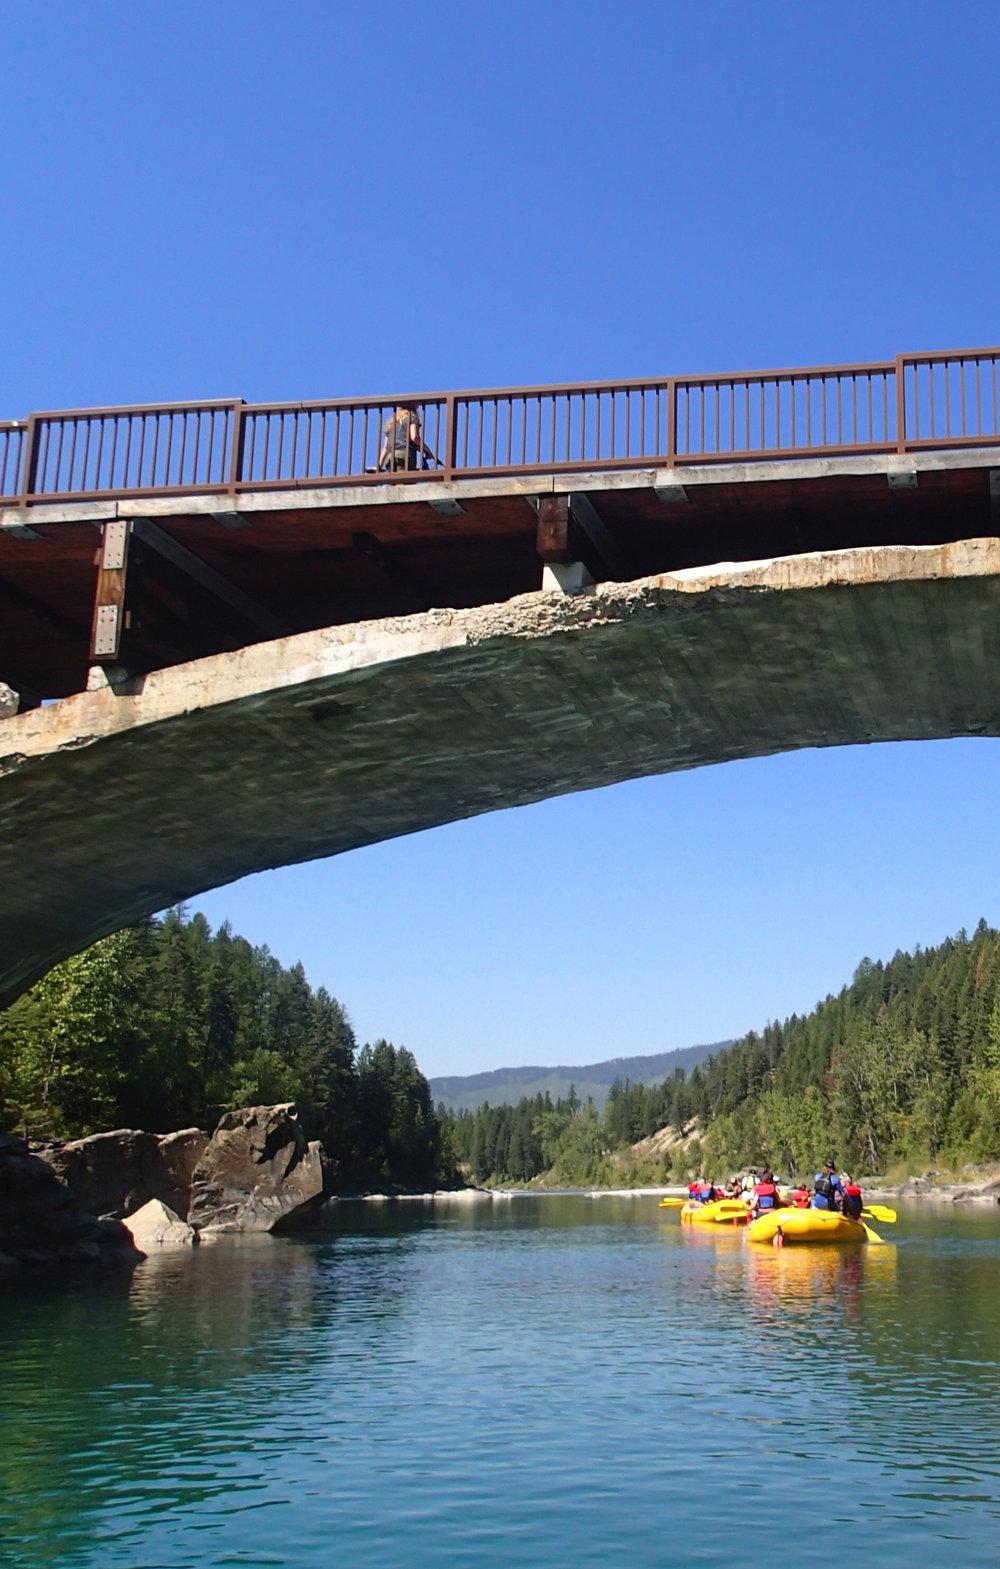 bridge over the river Flatwater.jpg